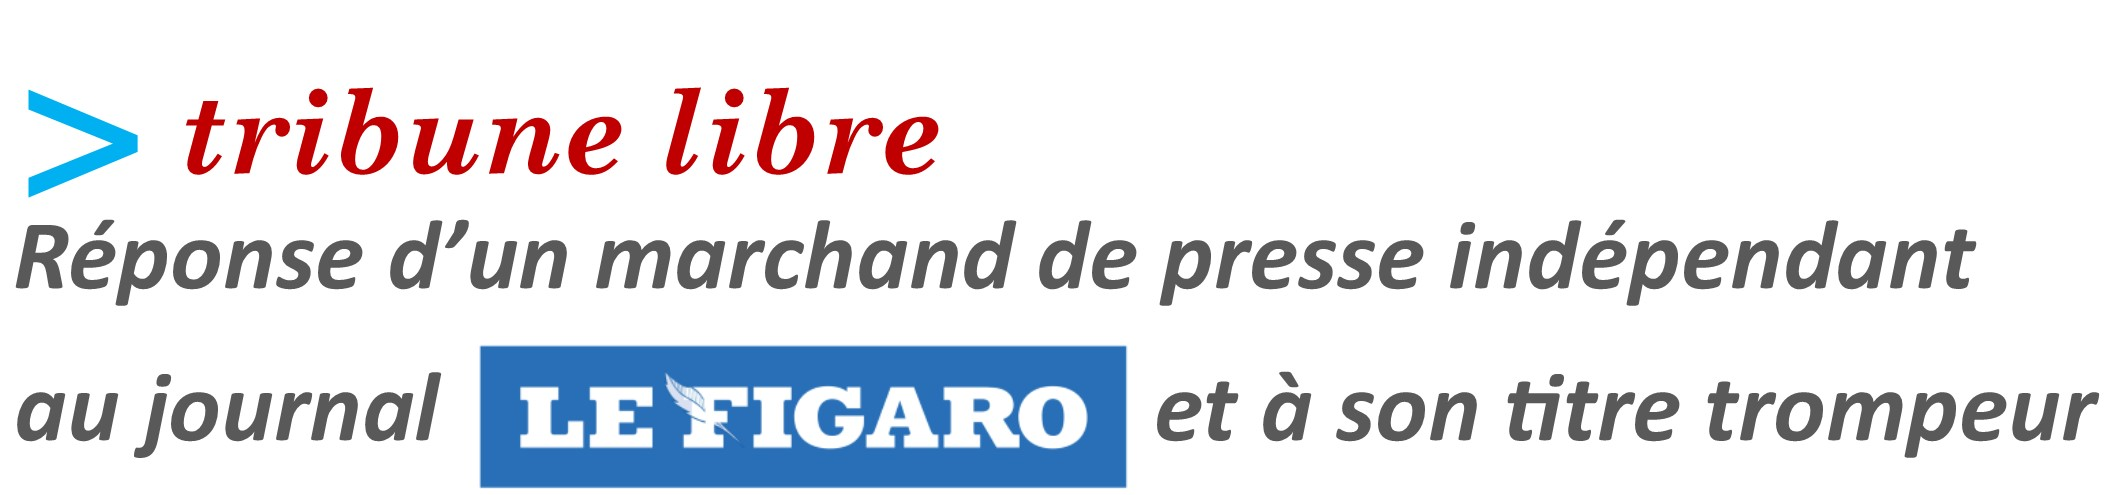 bandeau-Figaro.jpg